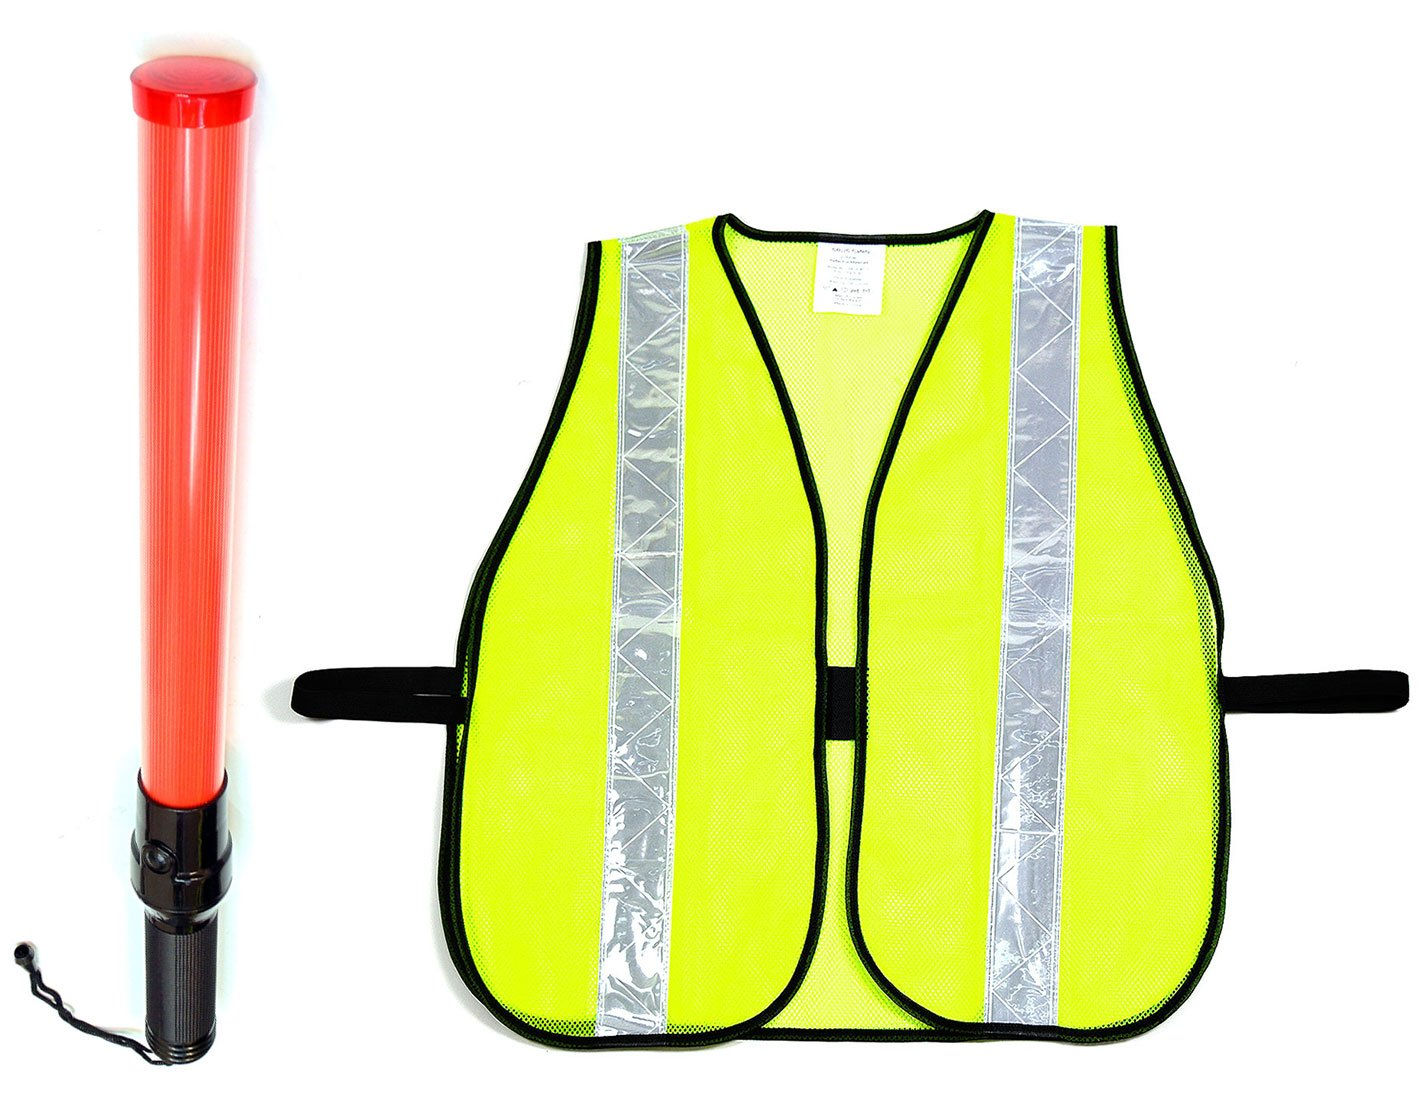 RK Signal Traffic Wand Baton LED Flashlight and Safety Vest Combo Set (21 -Inch, Safety Vest -Lime)